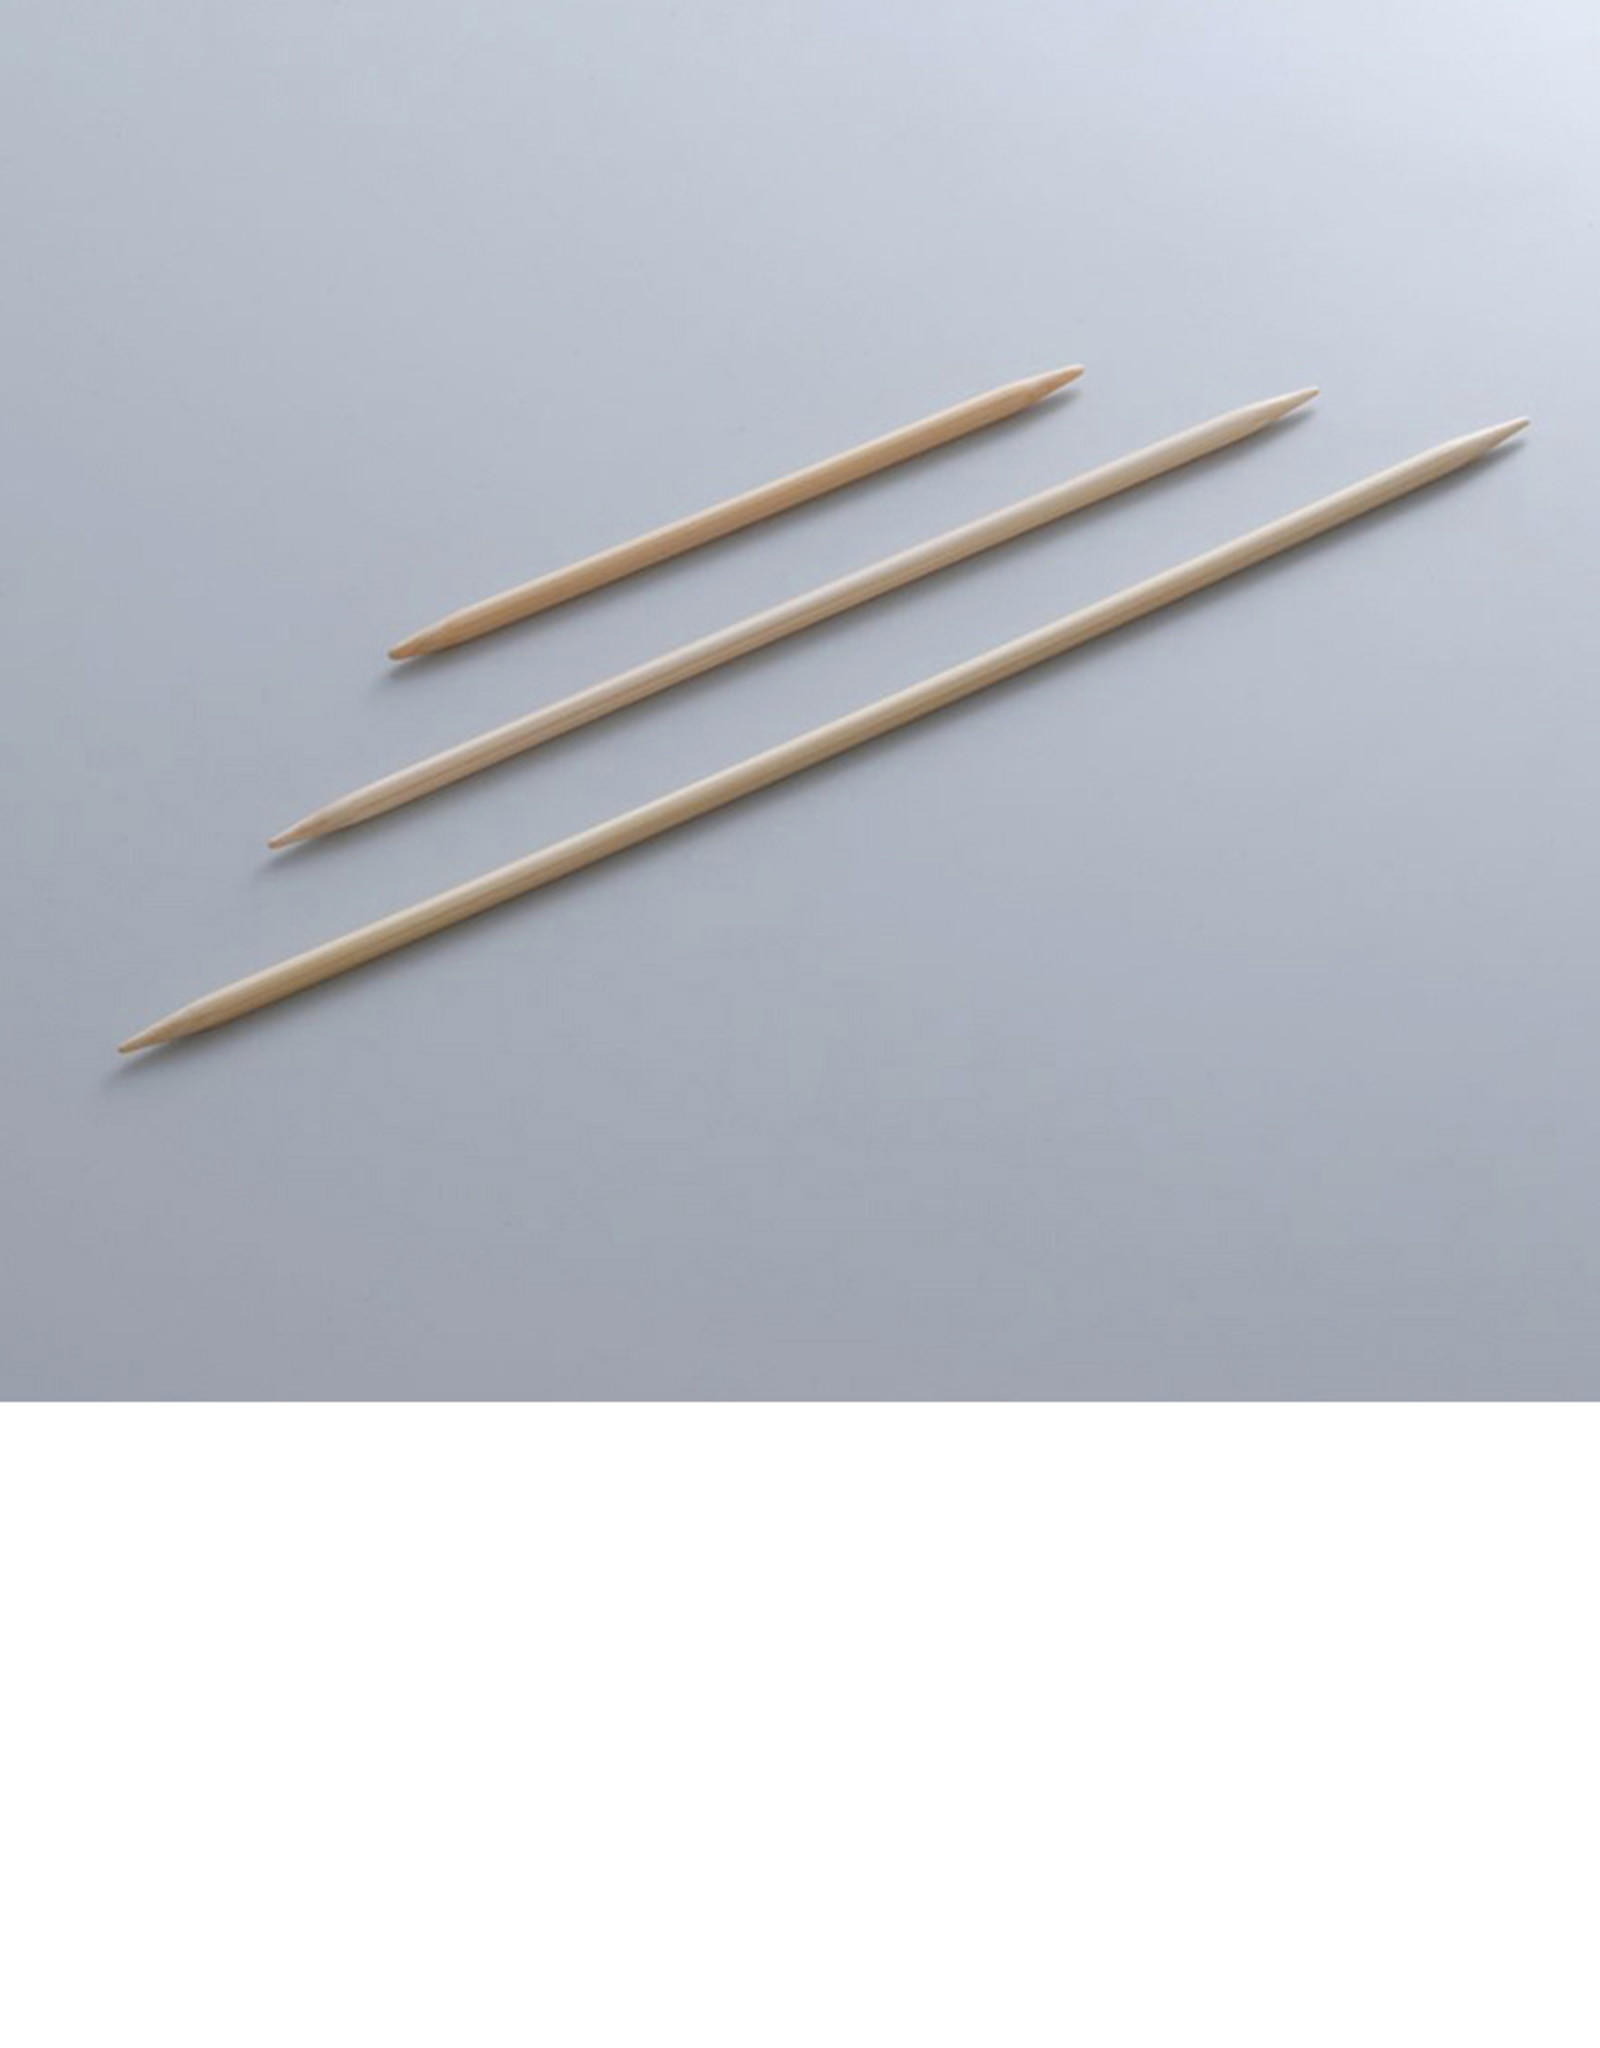 Kinki Amibari KA Double Point Needles US 0